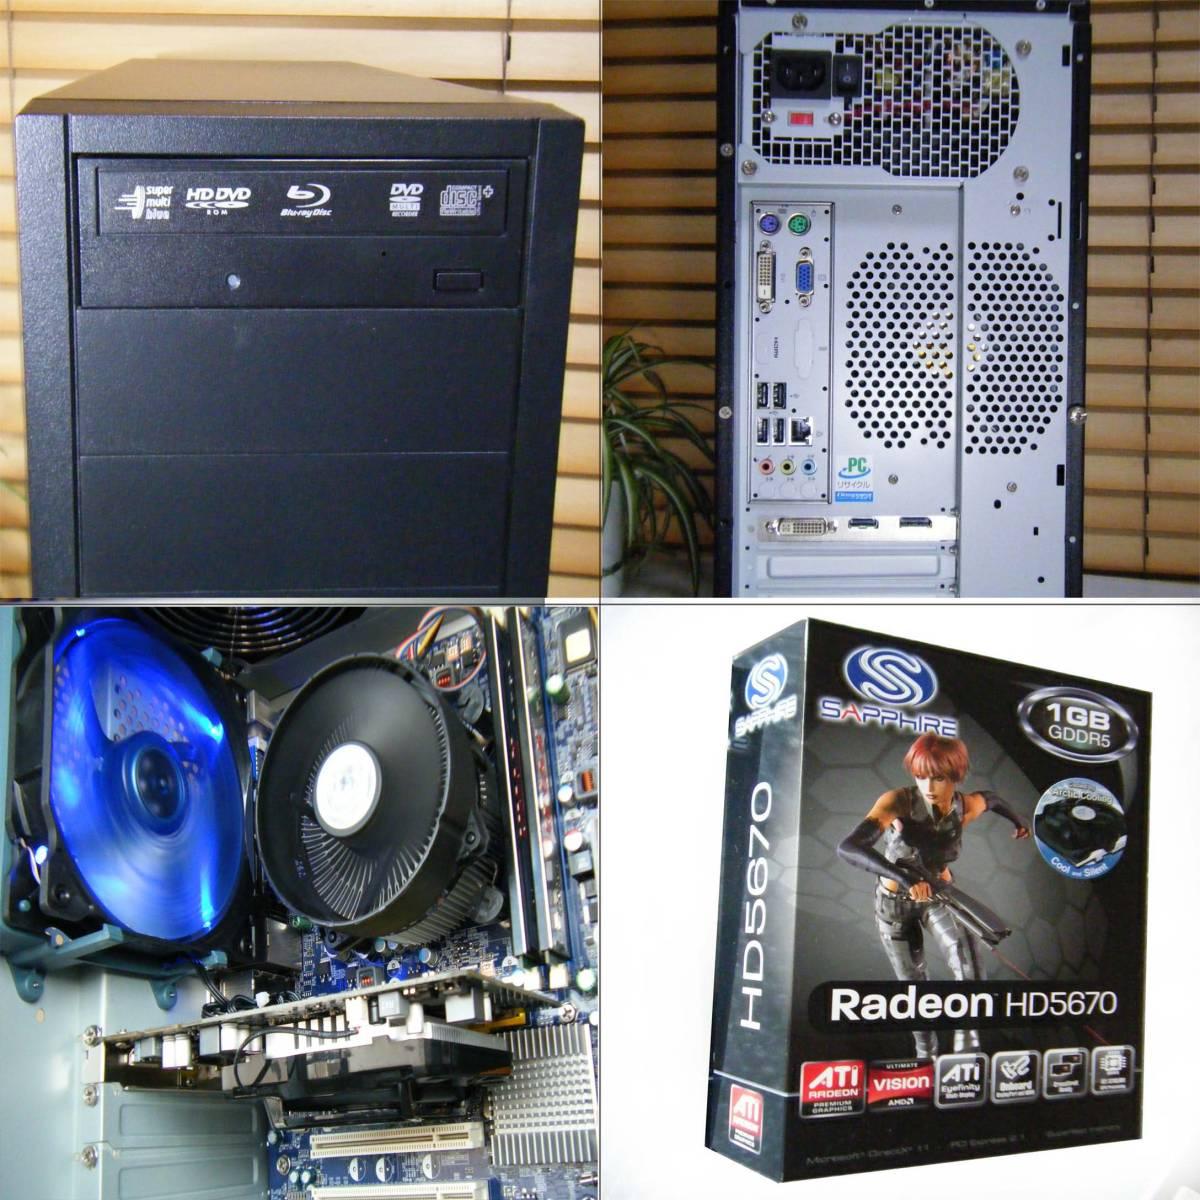 ◆ 秒速/i7 3770/自作Prime H61MX/Blu-ray/新品SSD 160GB/HDD 1TB+250GB/Office2016/Win10キー付 ◆_画像6